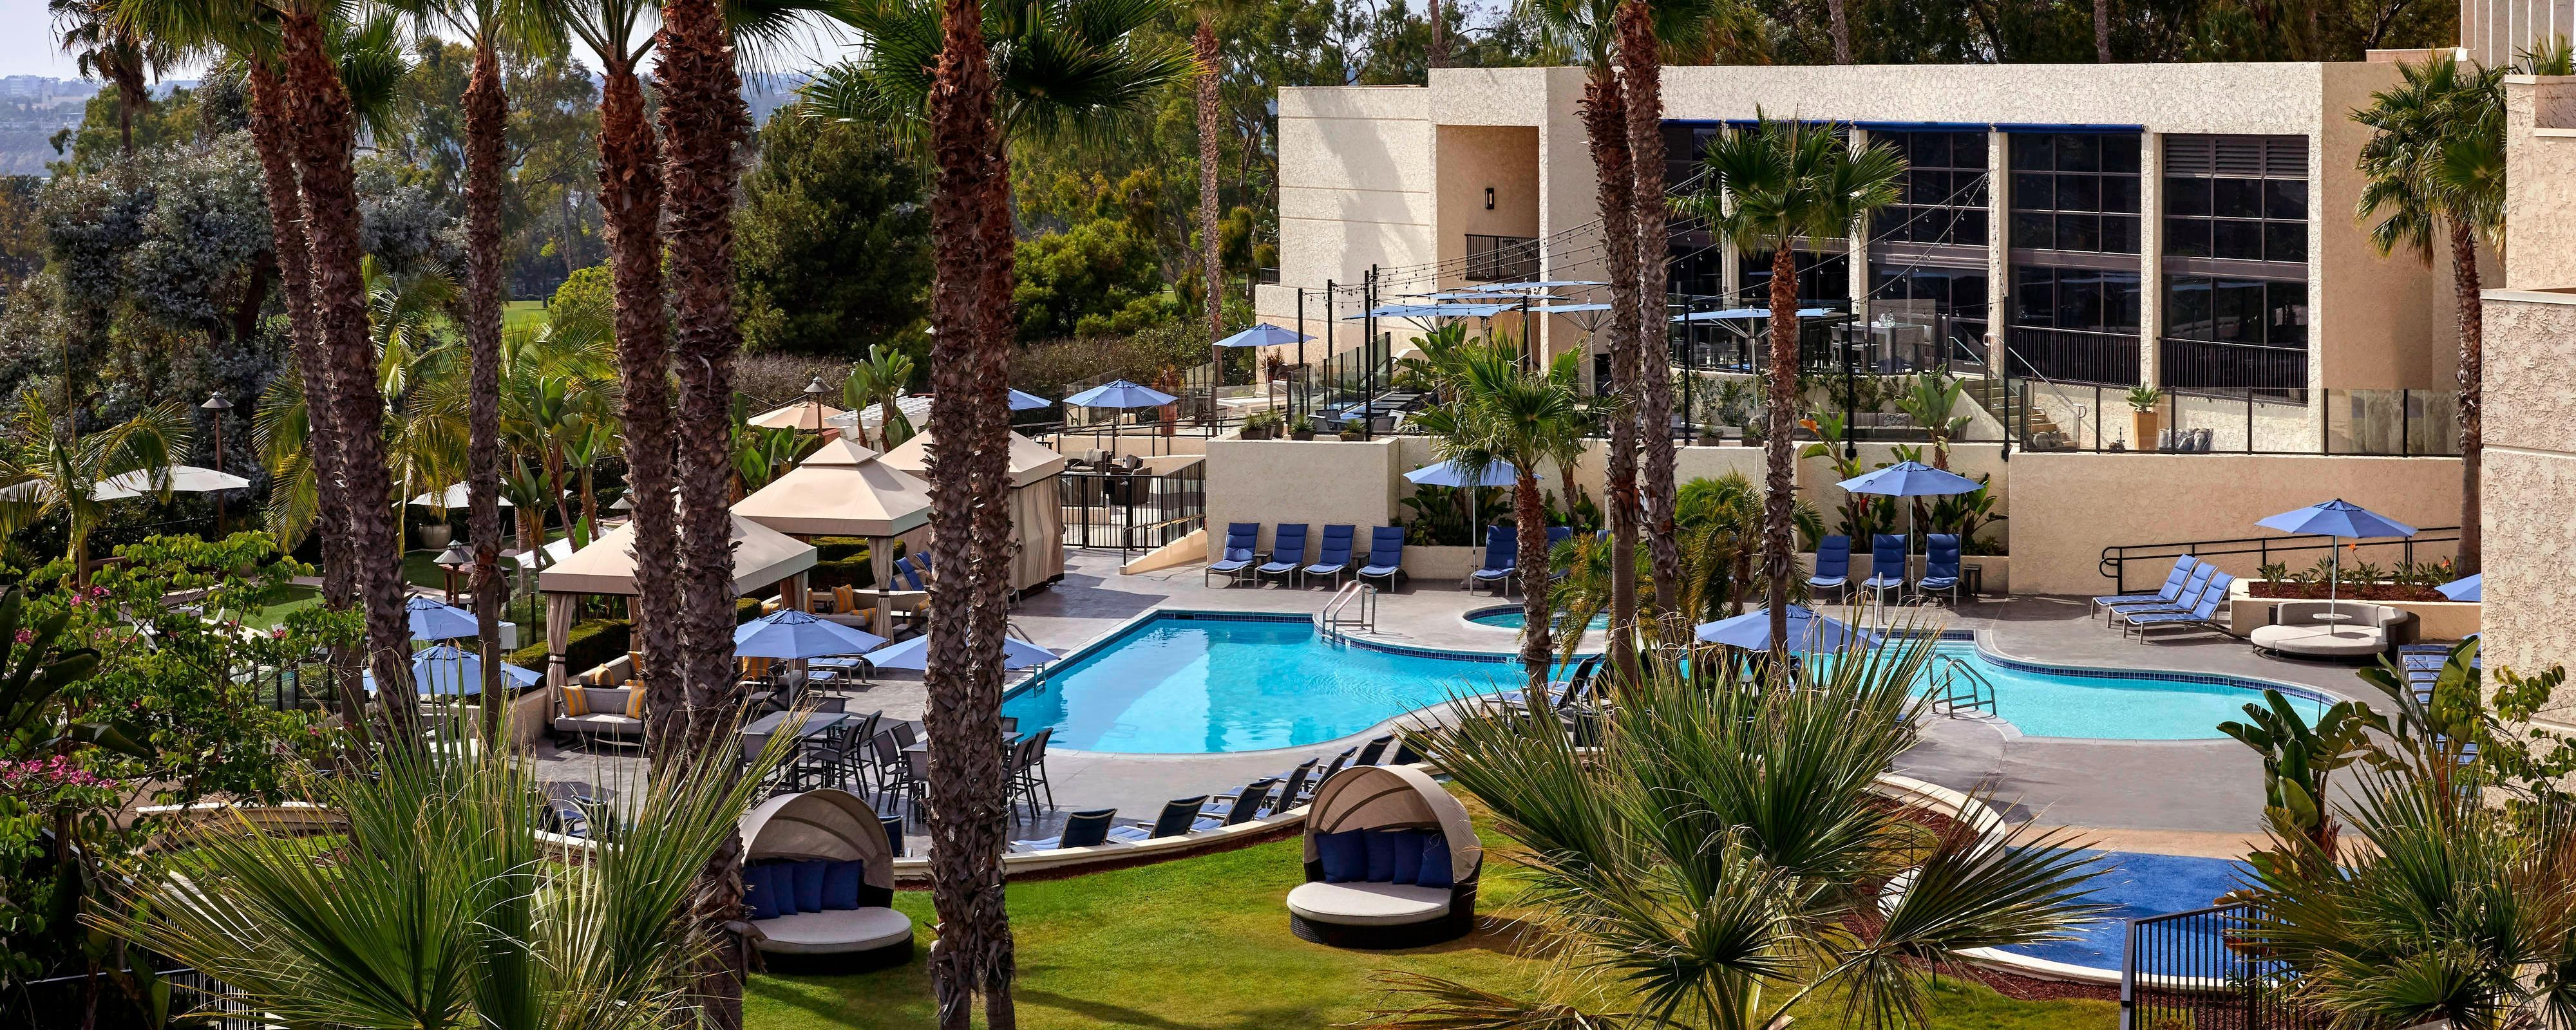 Newport Beach Hotel Gym | Newport Beach Marriott Hotel & Spa